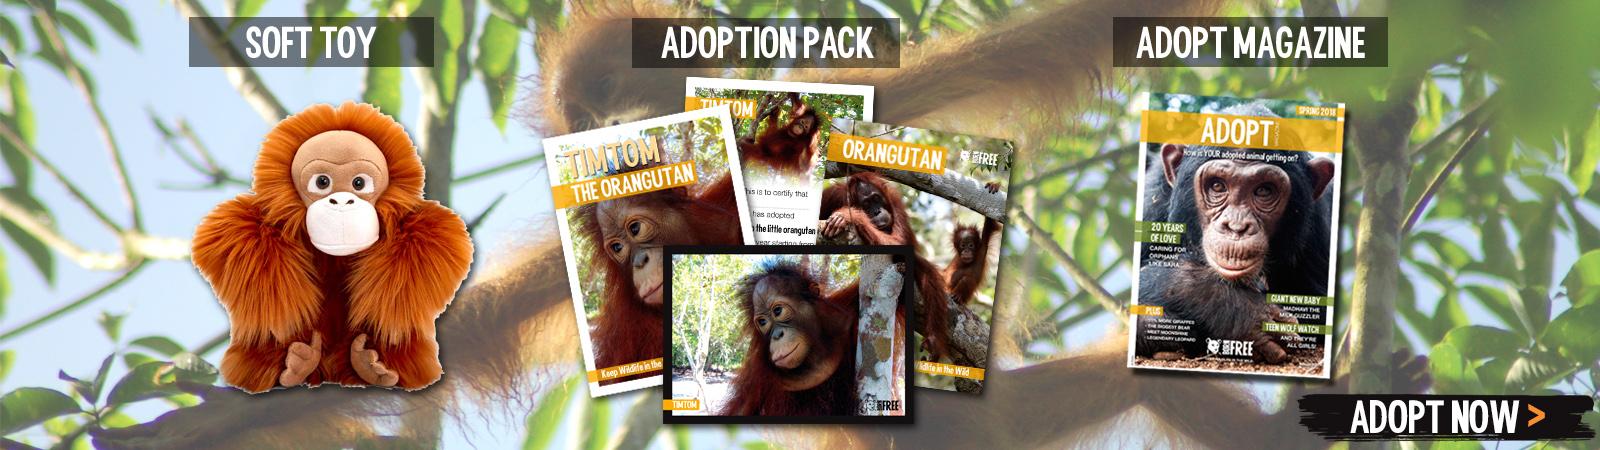 Sponsor a Orangutan